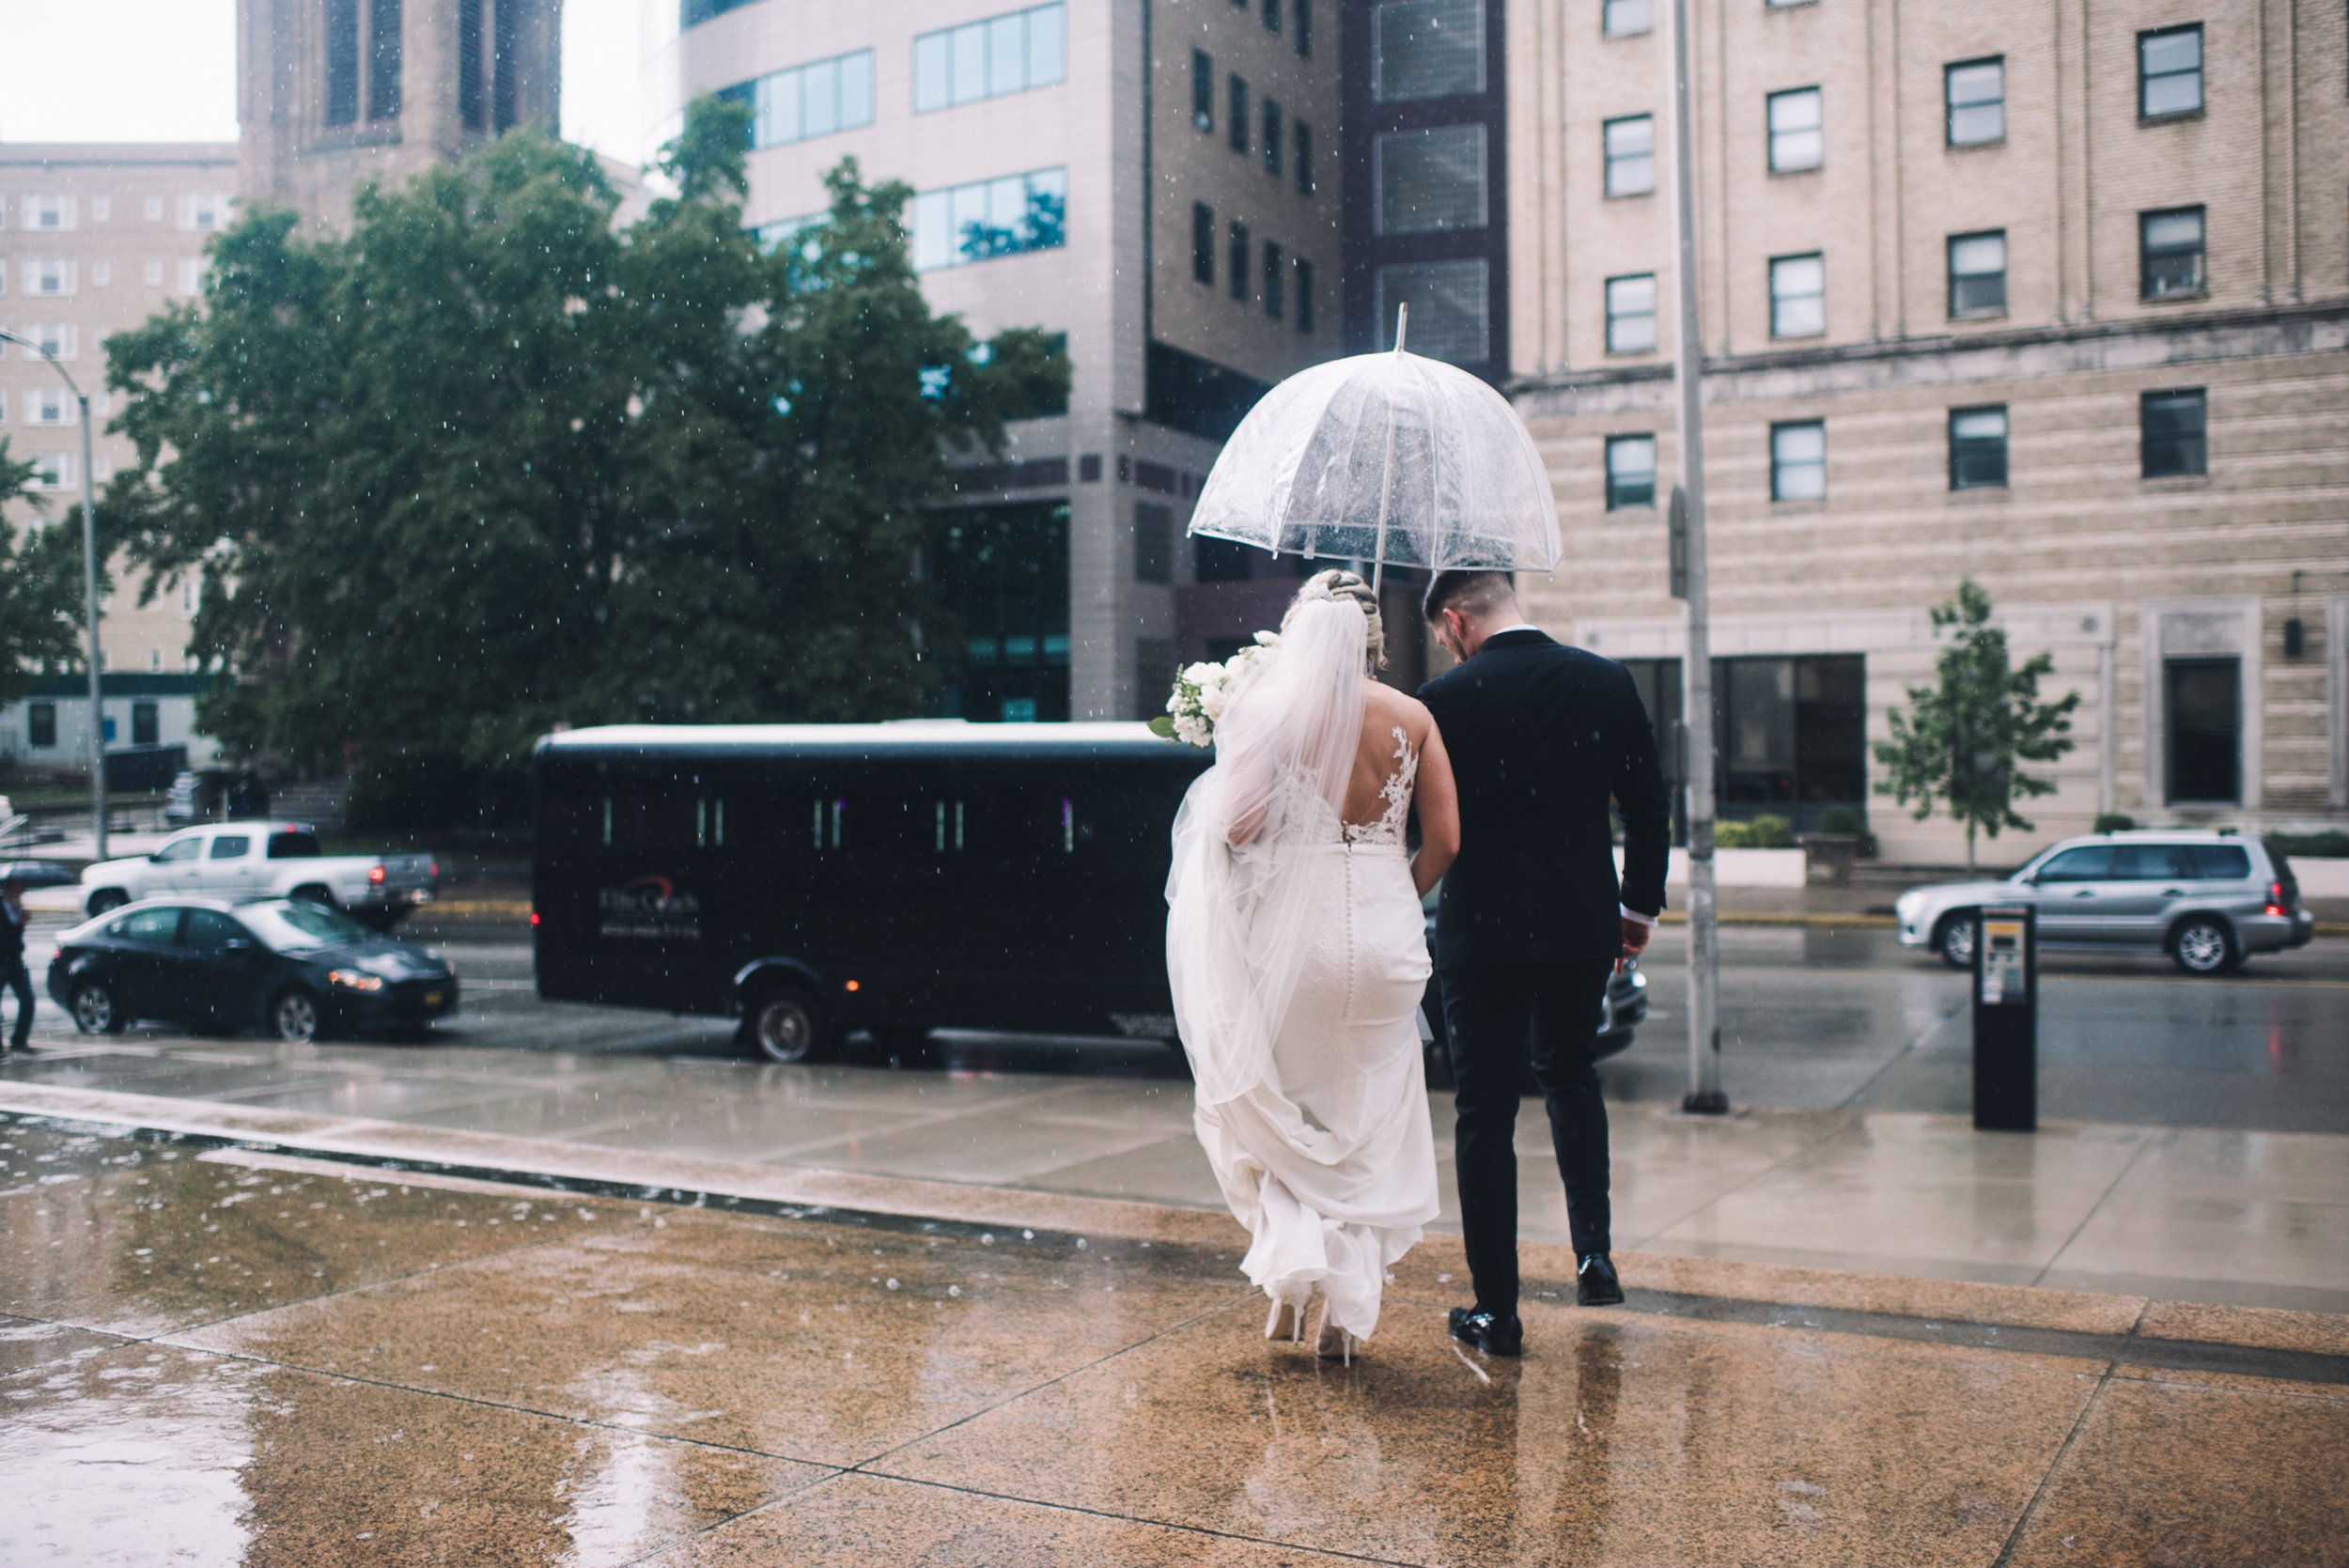 Pittsburgh Pennsylvania New York NYC Wedding Photographer Photojournalist Luxury Downtown Opera - Stirpe 909.jpg